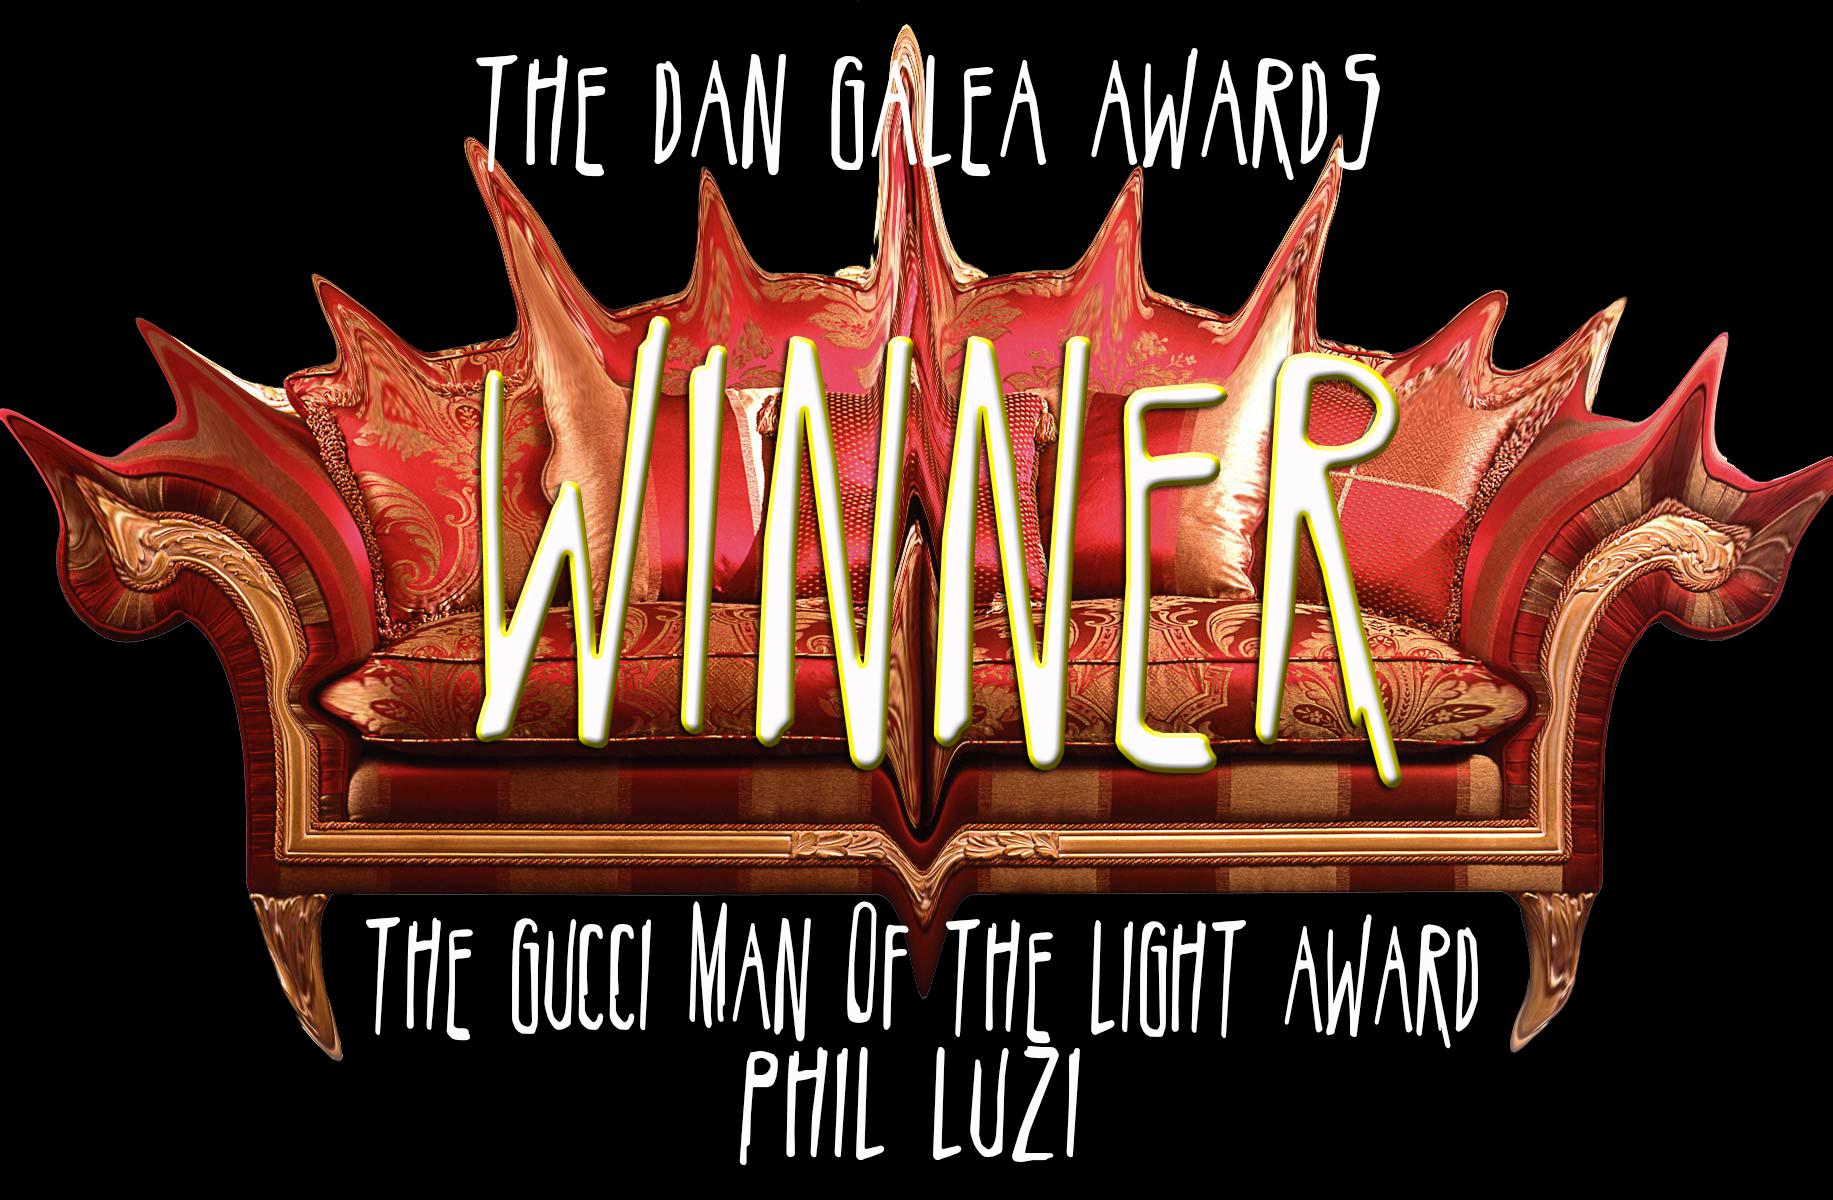 DGawards Phil Luzi.jpg